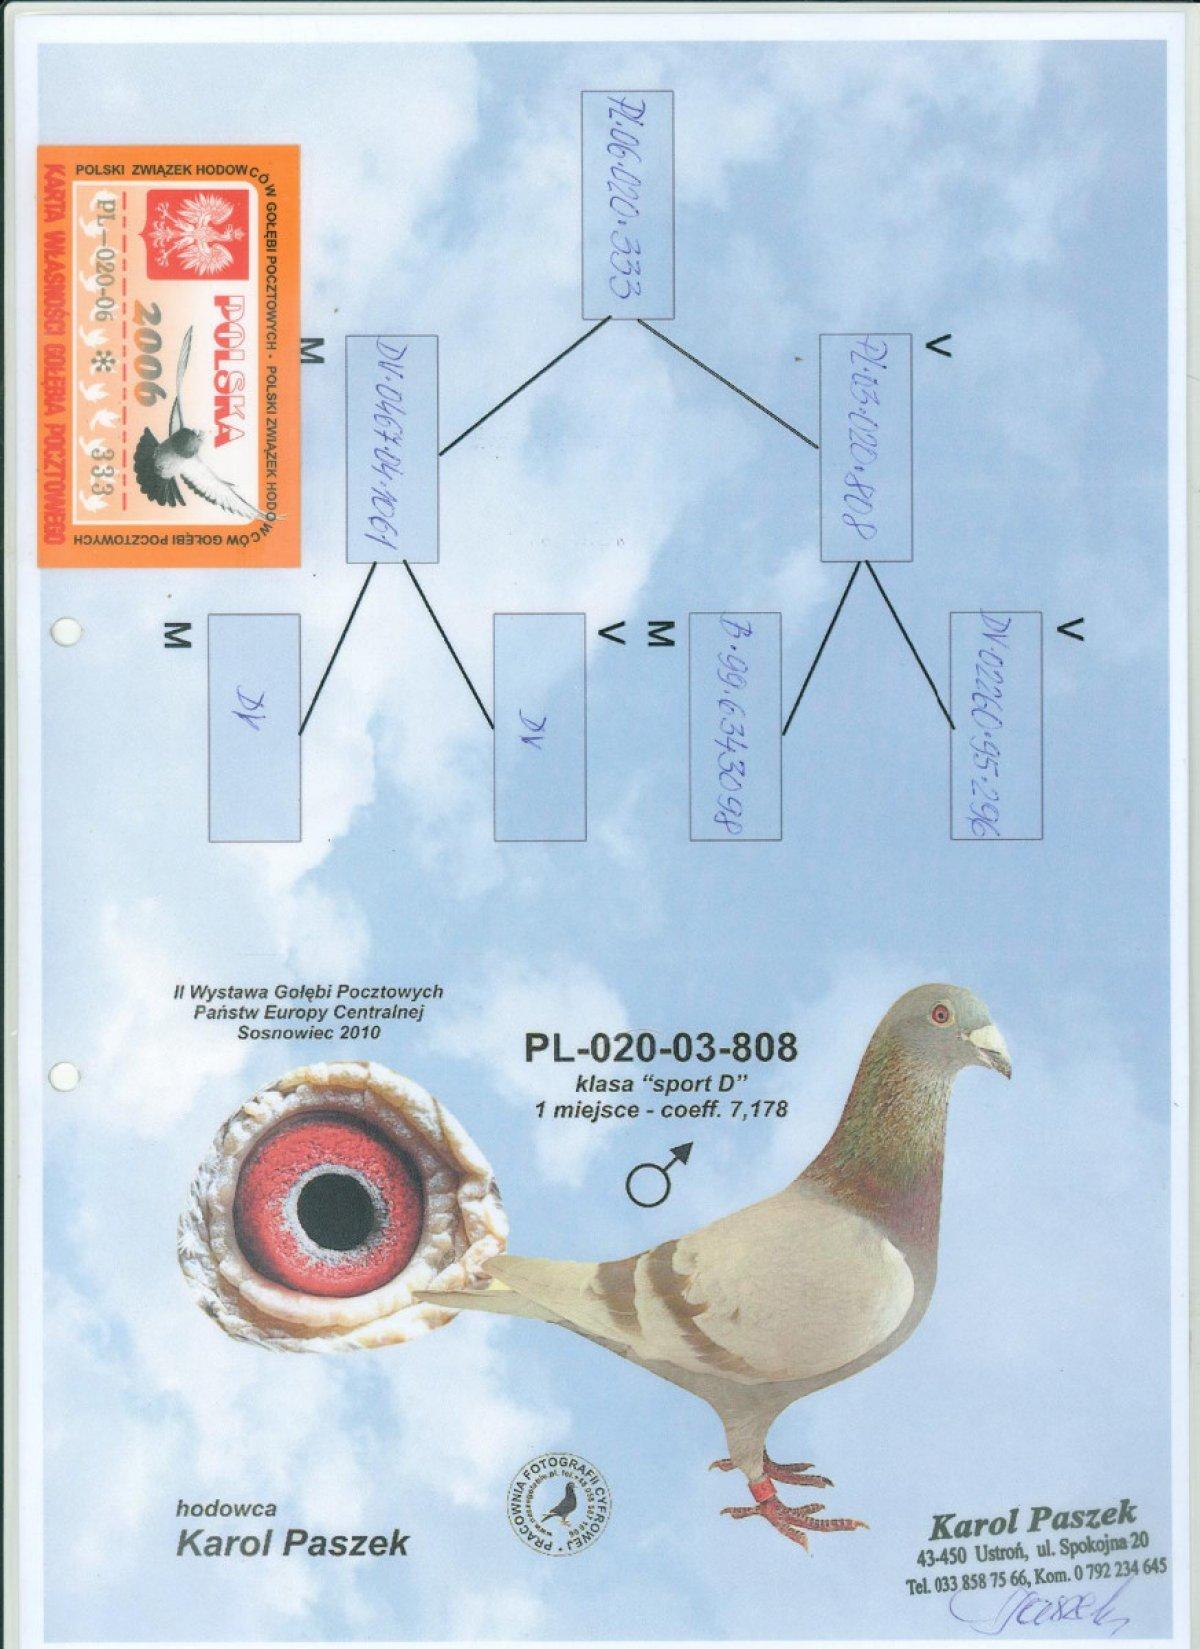 PL-020-06-333